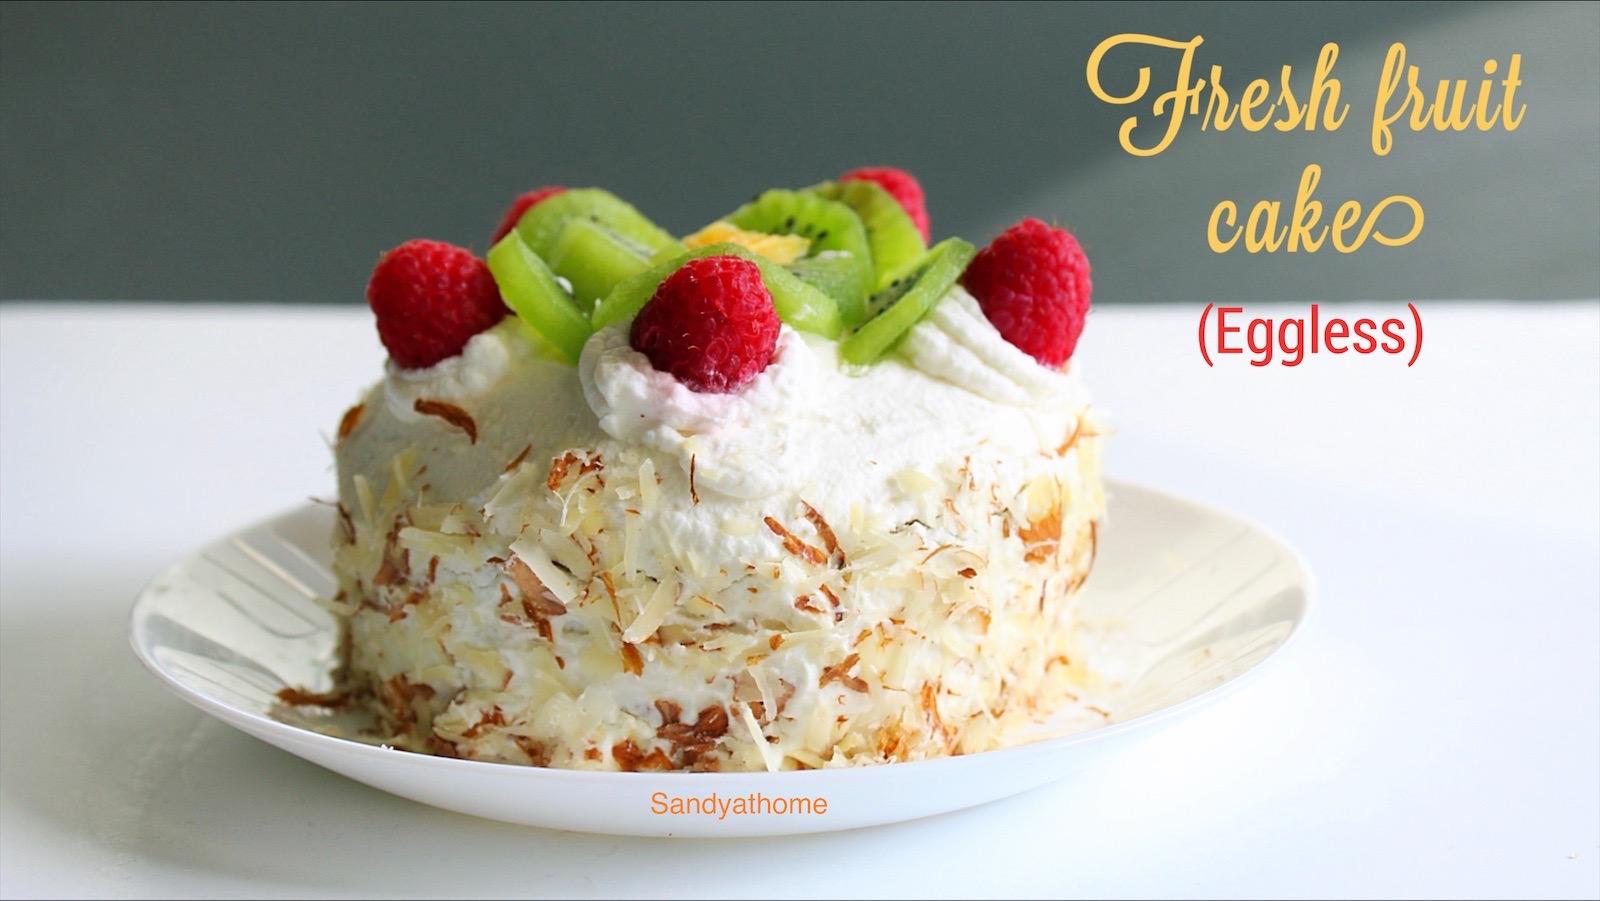 Fresh fruit cake recipe, Eggless fruit cake | Sandhya's